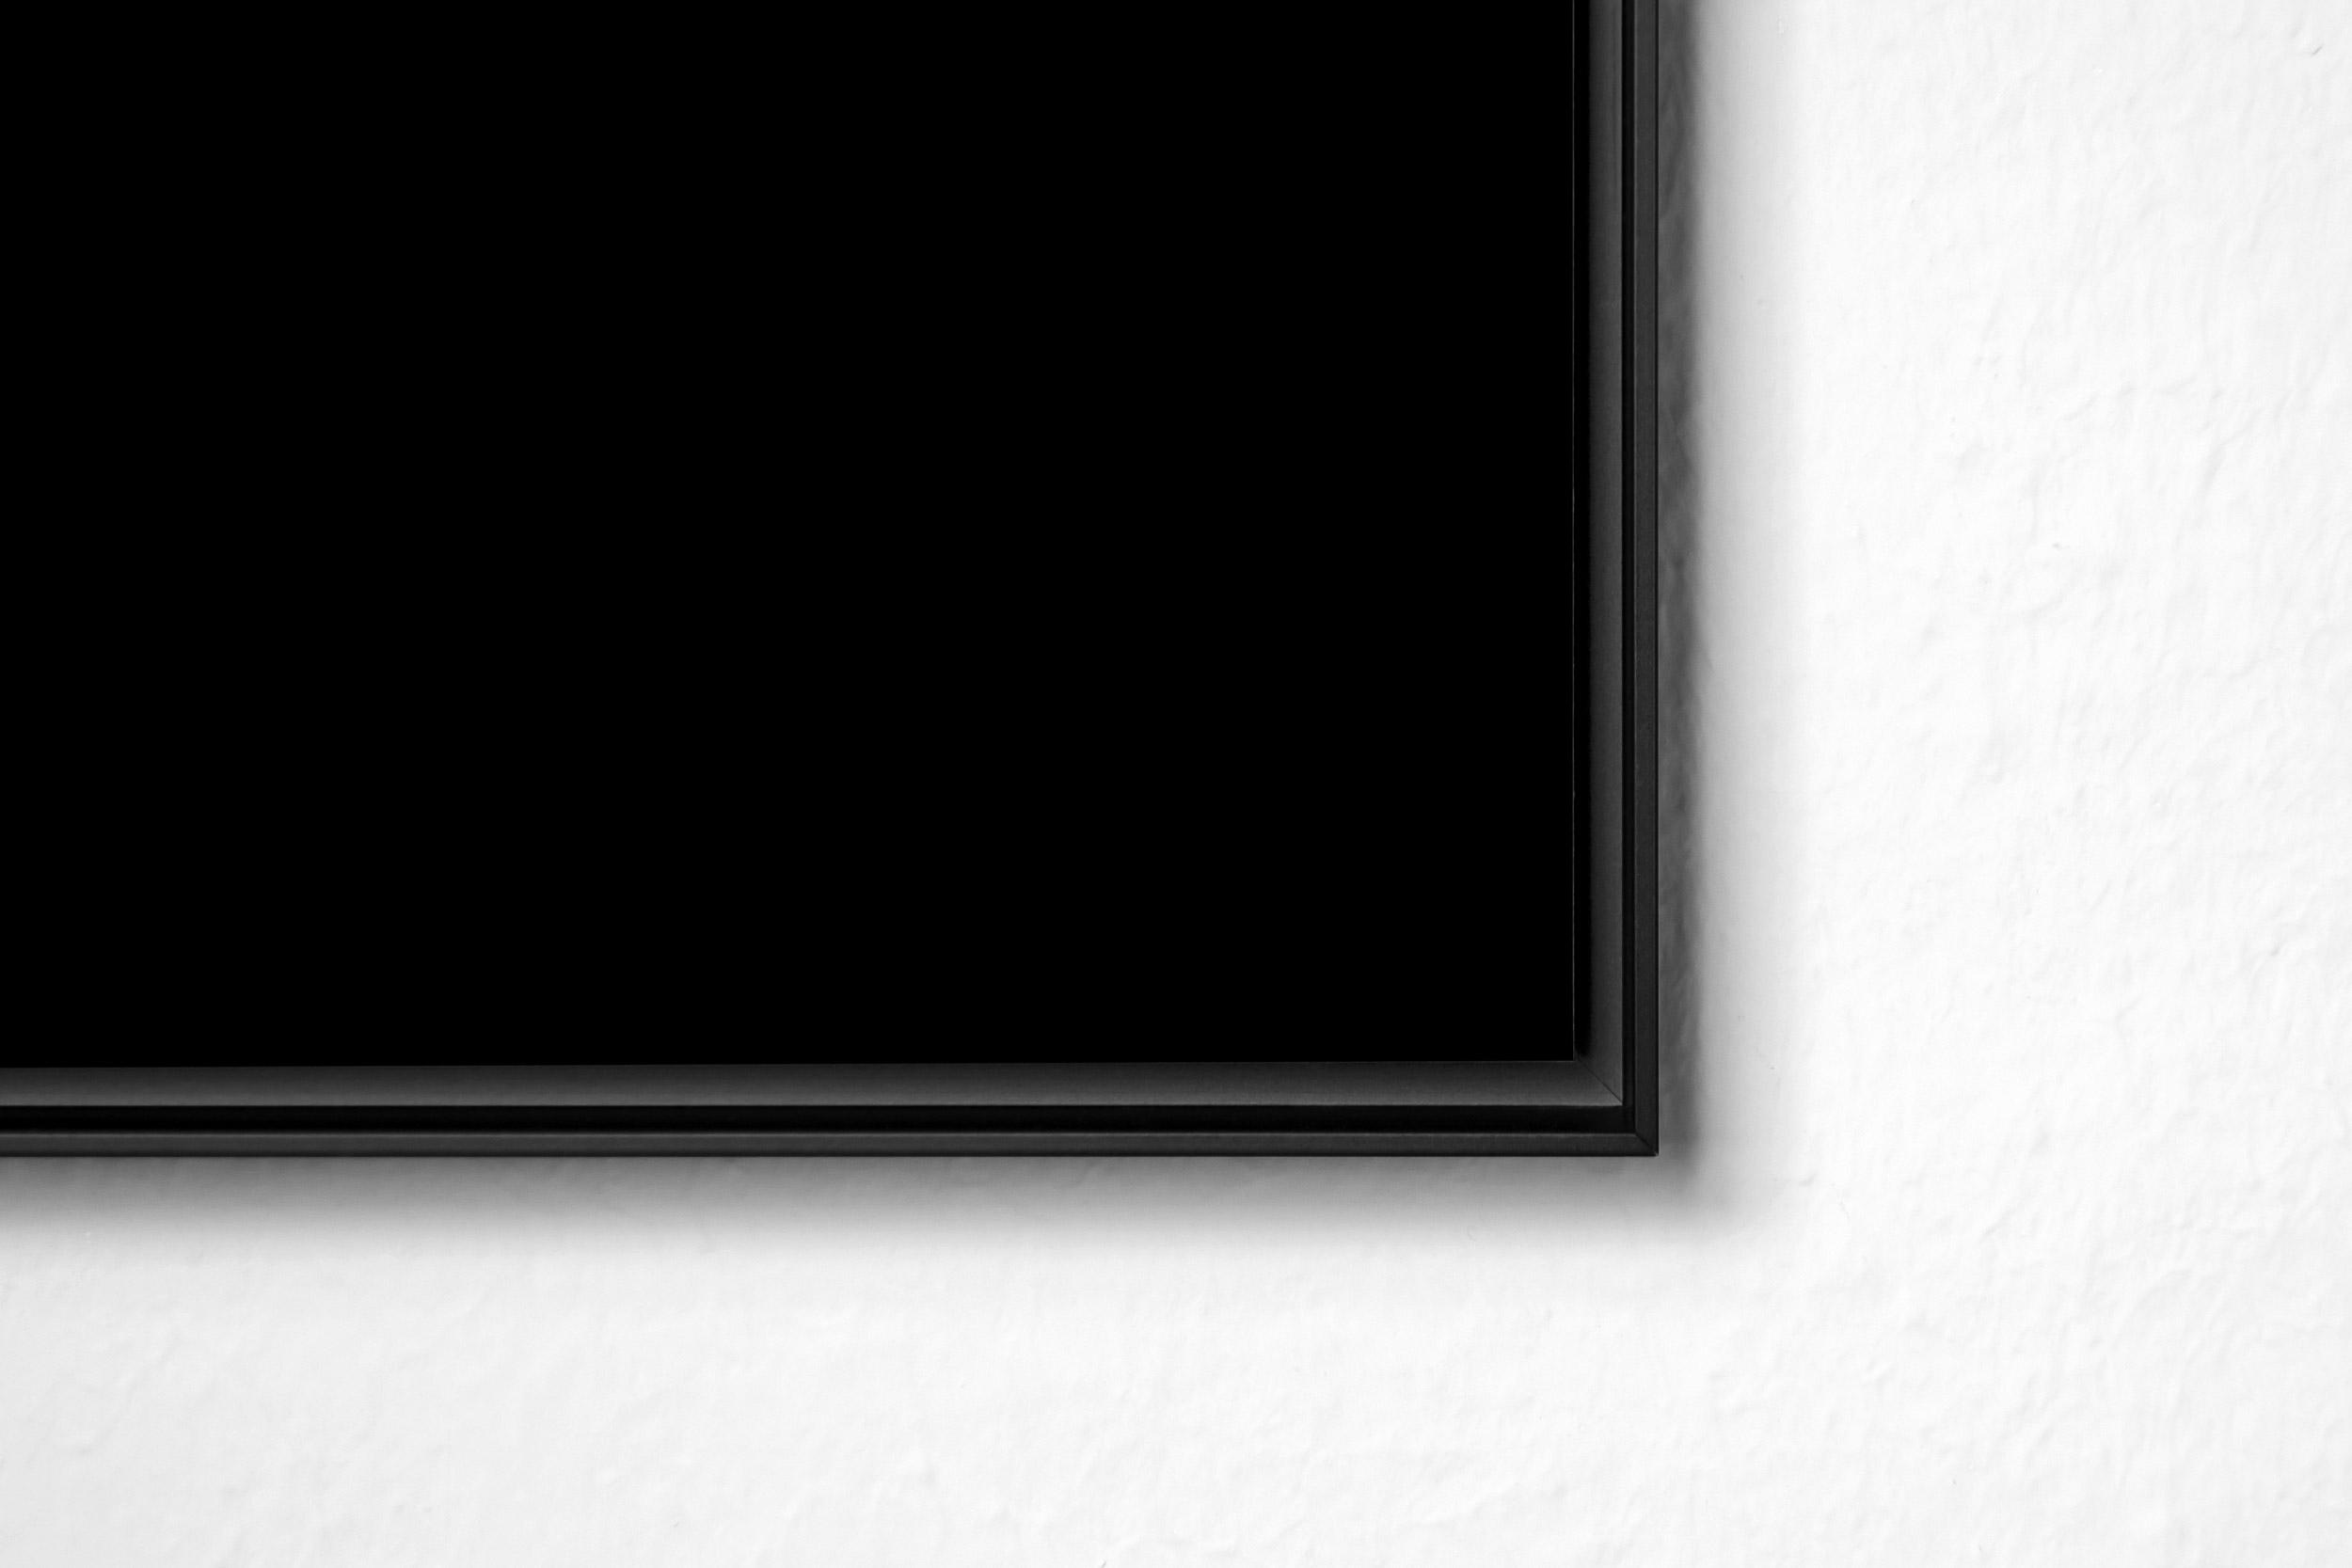 Vinylography Masterpiece Frame